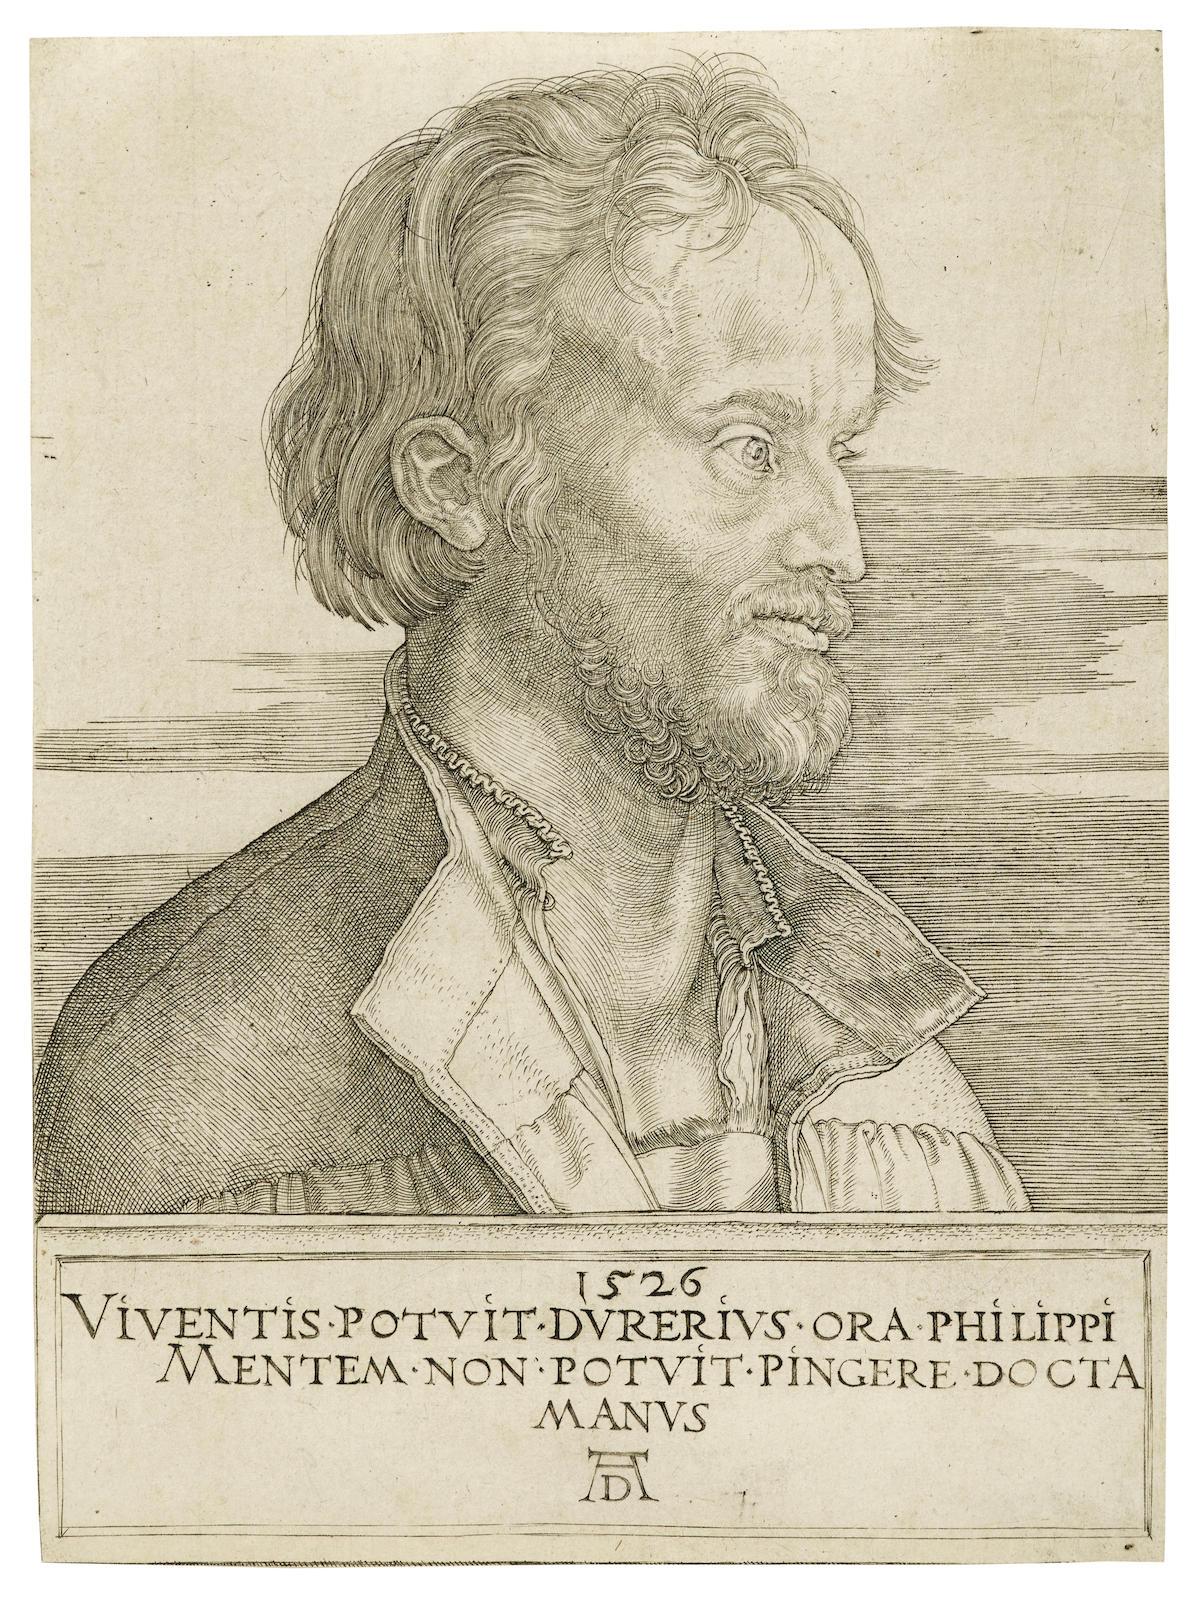 Albrecht Durer-Philip Melanchthon (B. 105; M., Holl. 104)-1526